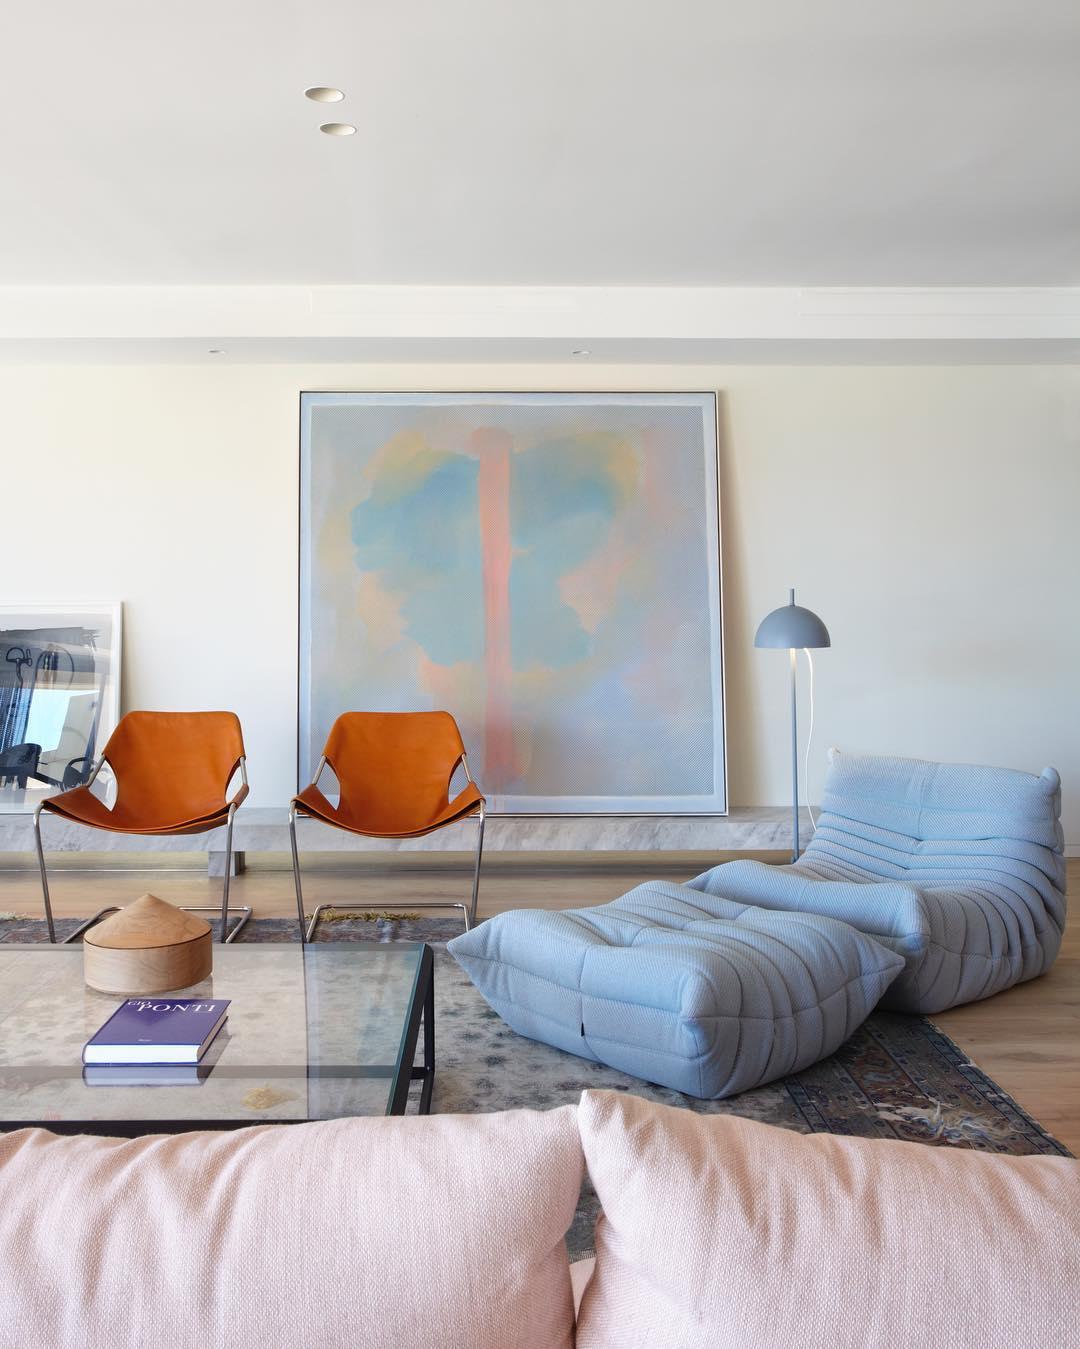 top 28 sydney interior designers Top 28 Sydney Interior Designers richards stanisich 530221472445160064949391698476226728699103n